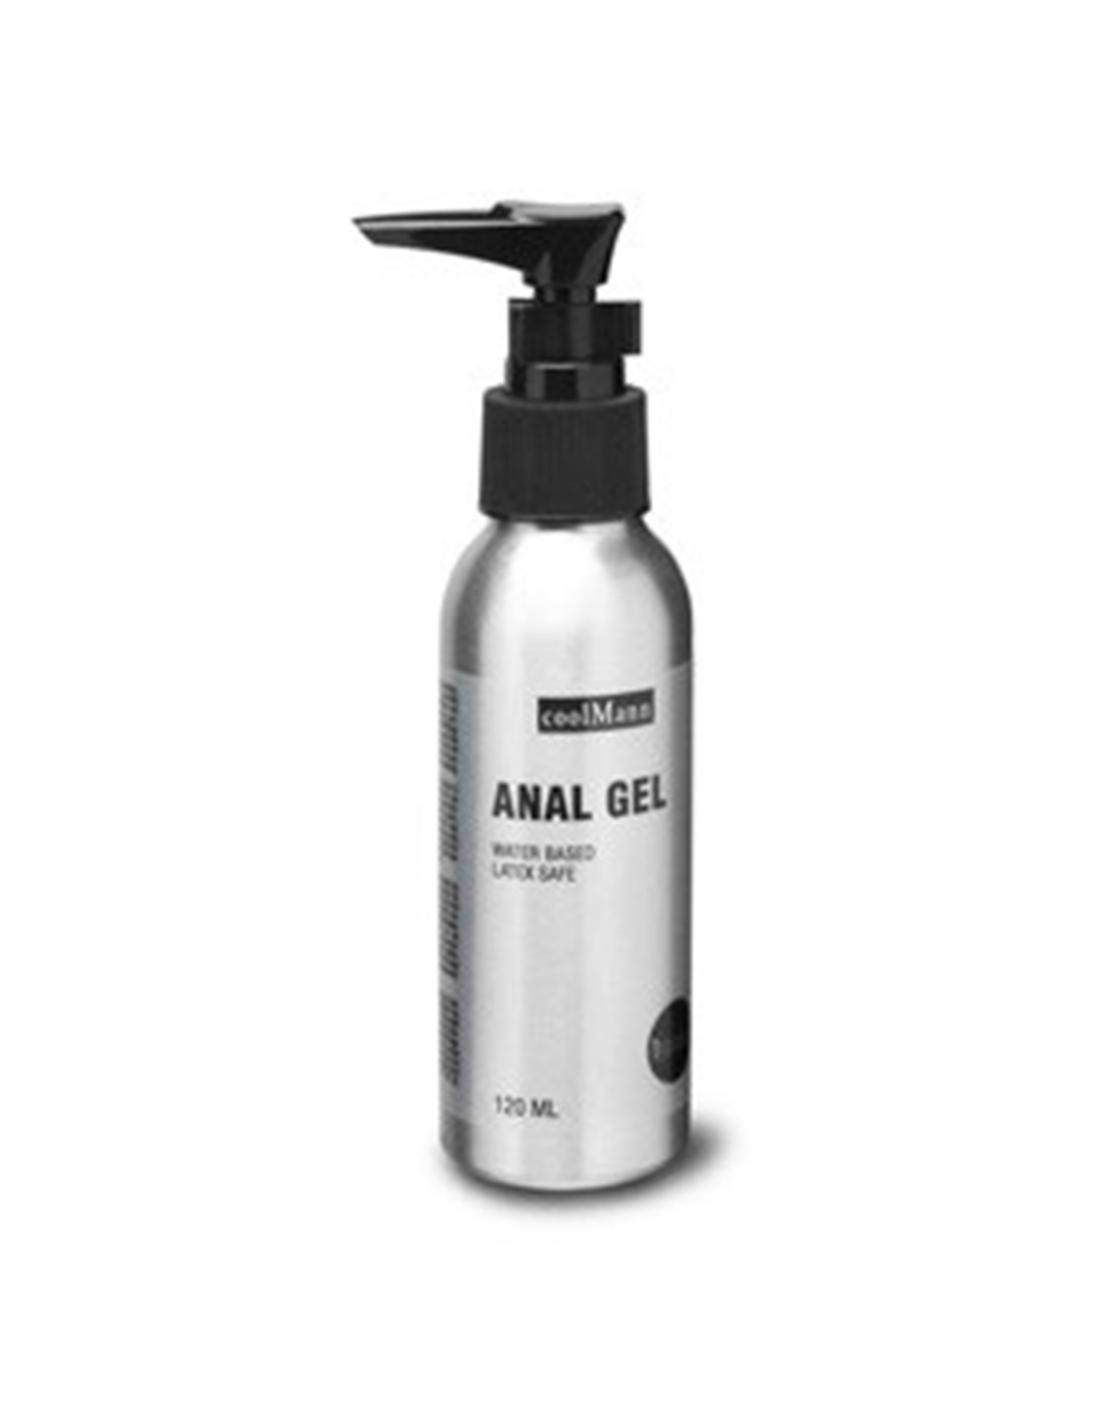 Lubrificante À Base De Água Coolmann Anal Gel - 150ml - PR2010314320